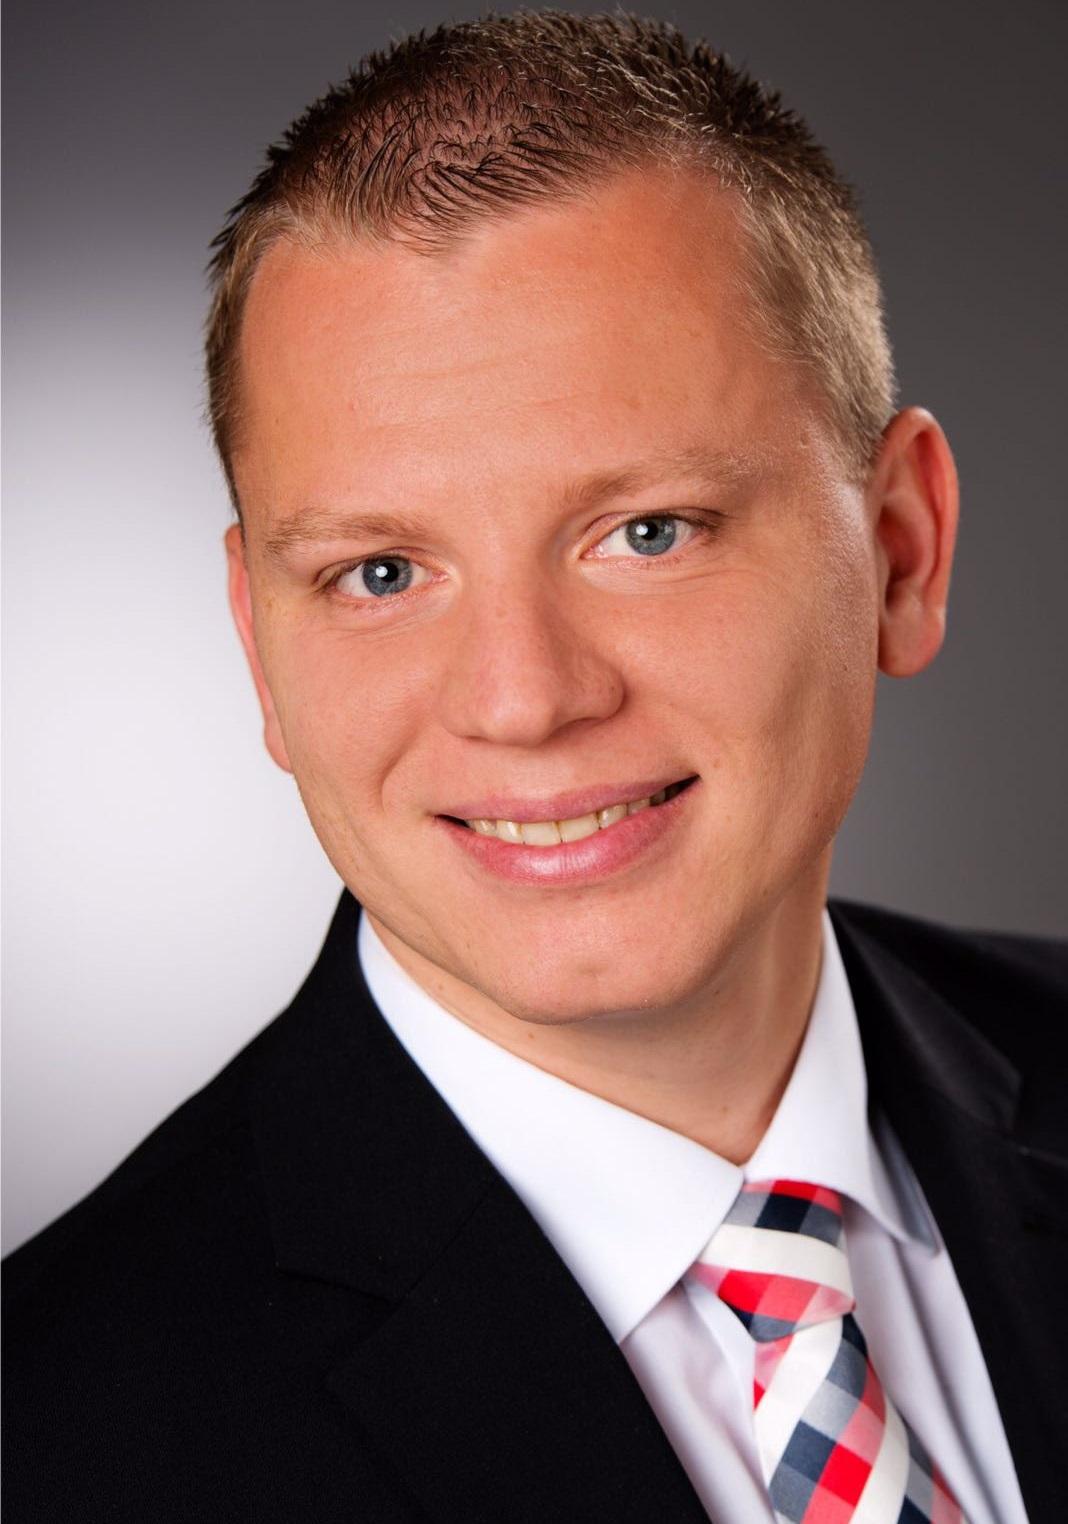 Tony Nehls » Wirtschaftsjunioren Neubrandenburg